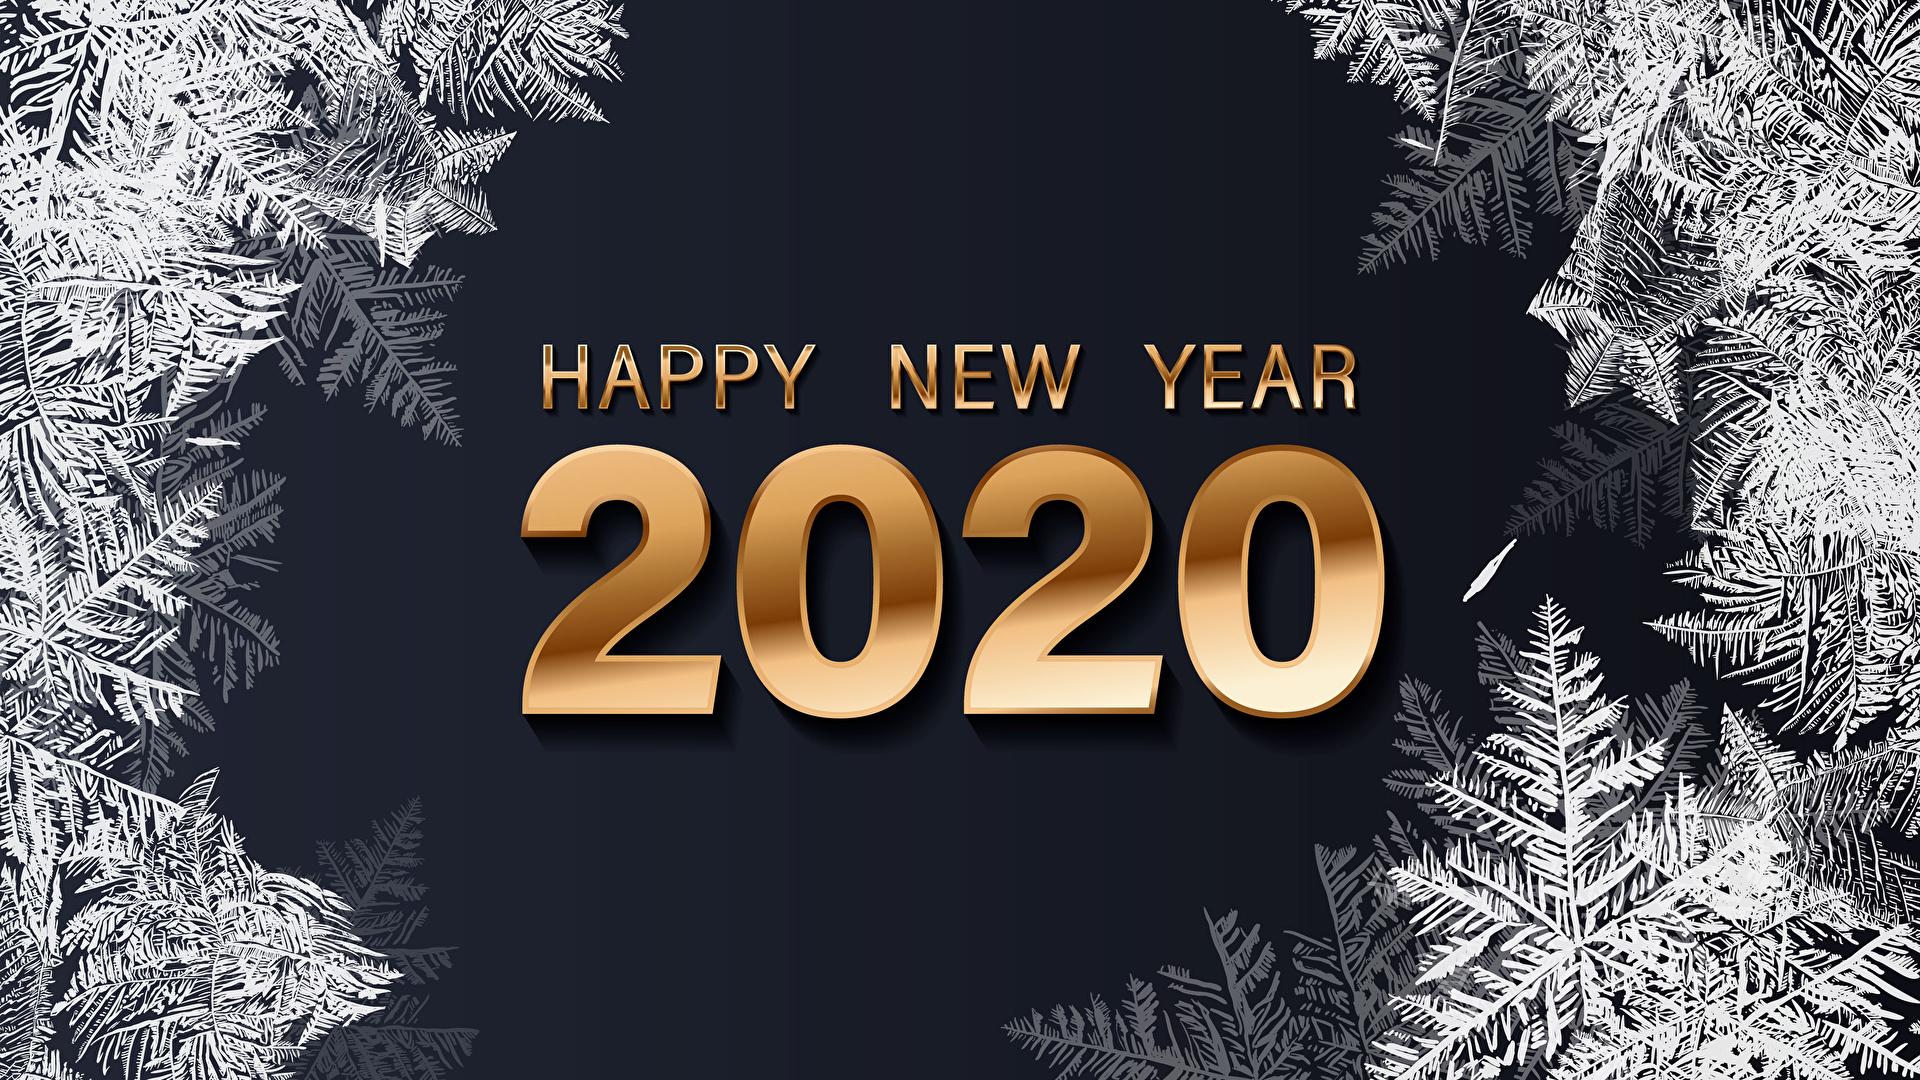 Image 2020 Christmas English Snowflakes Word   Lettering 1920x1080